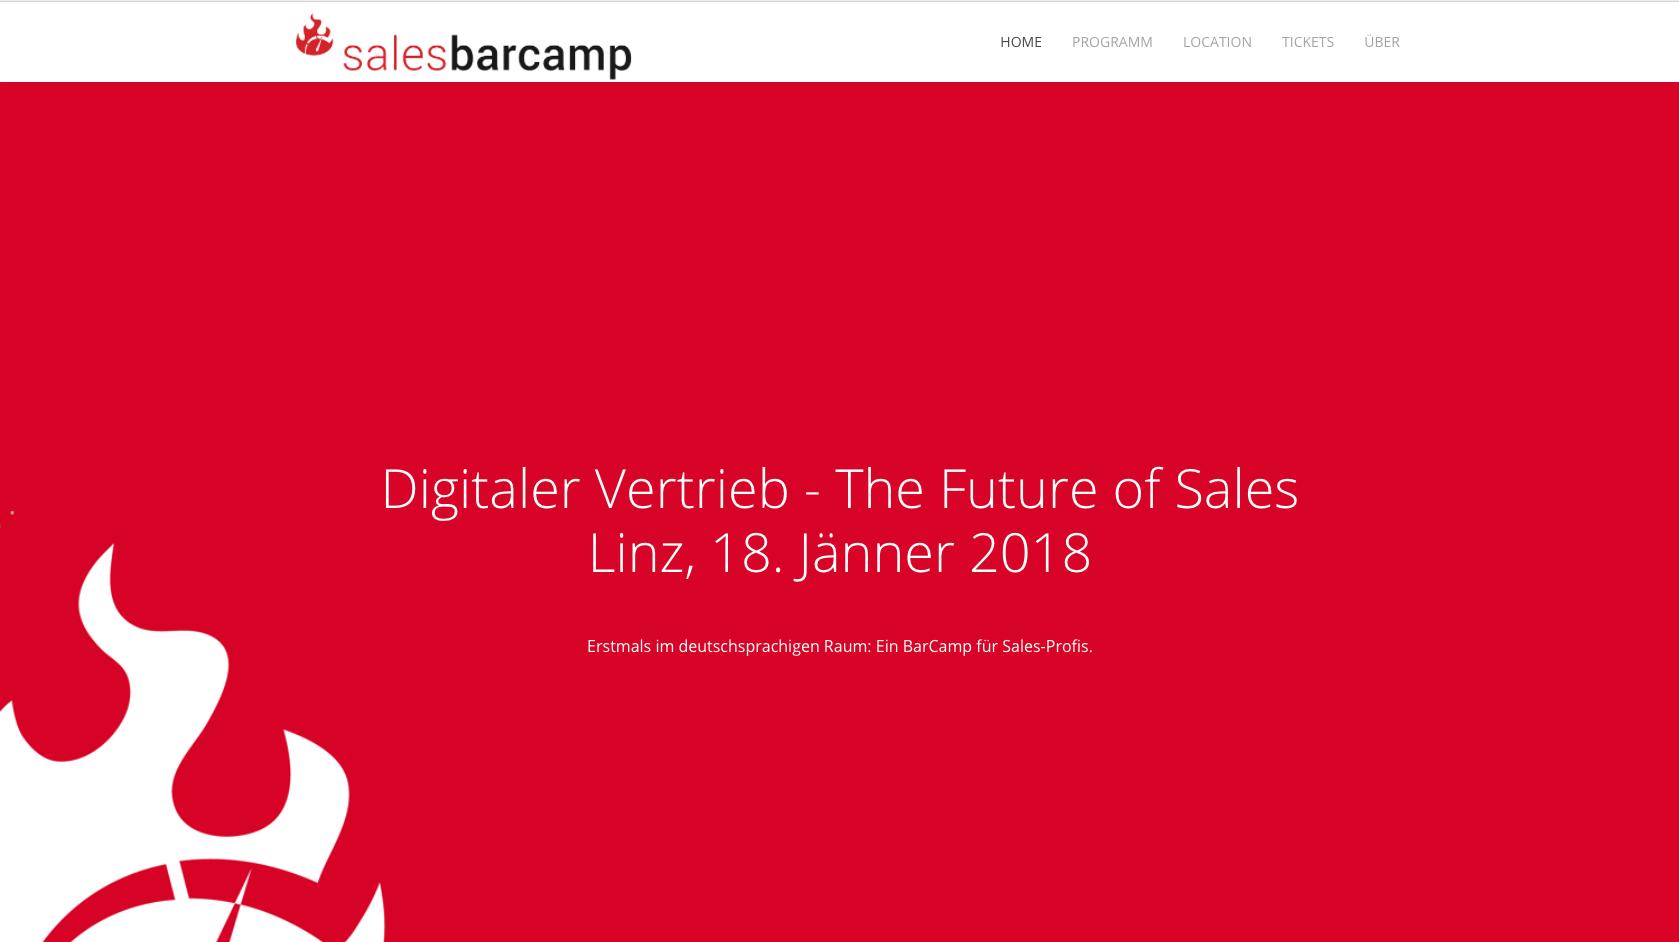 Salesbarcamp